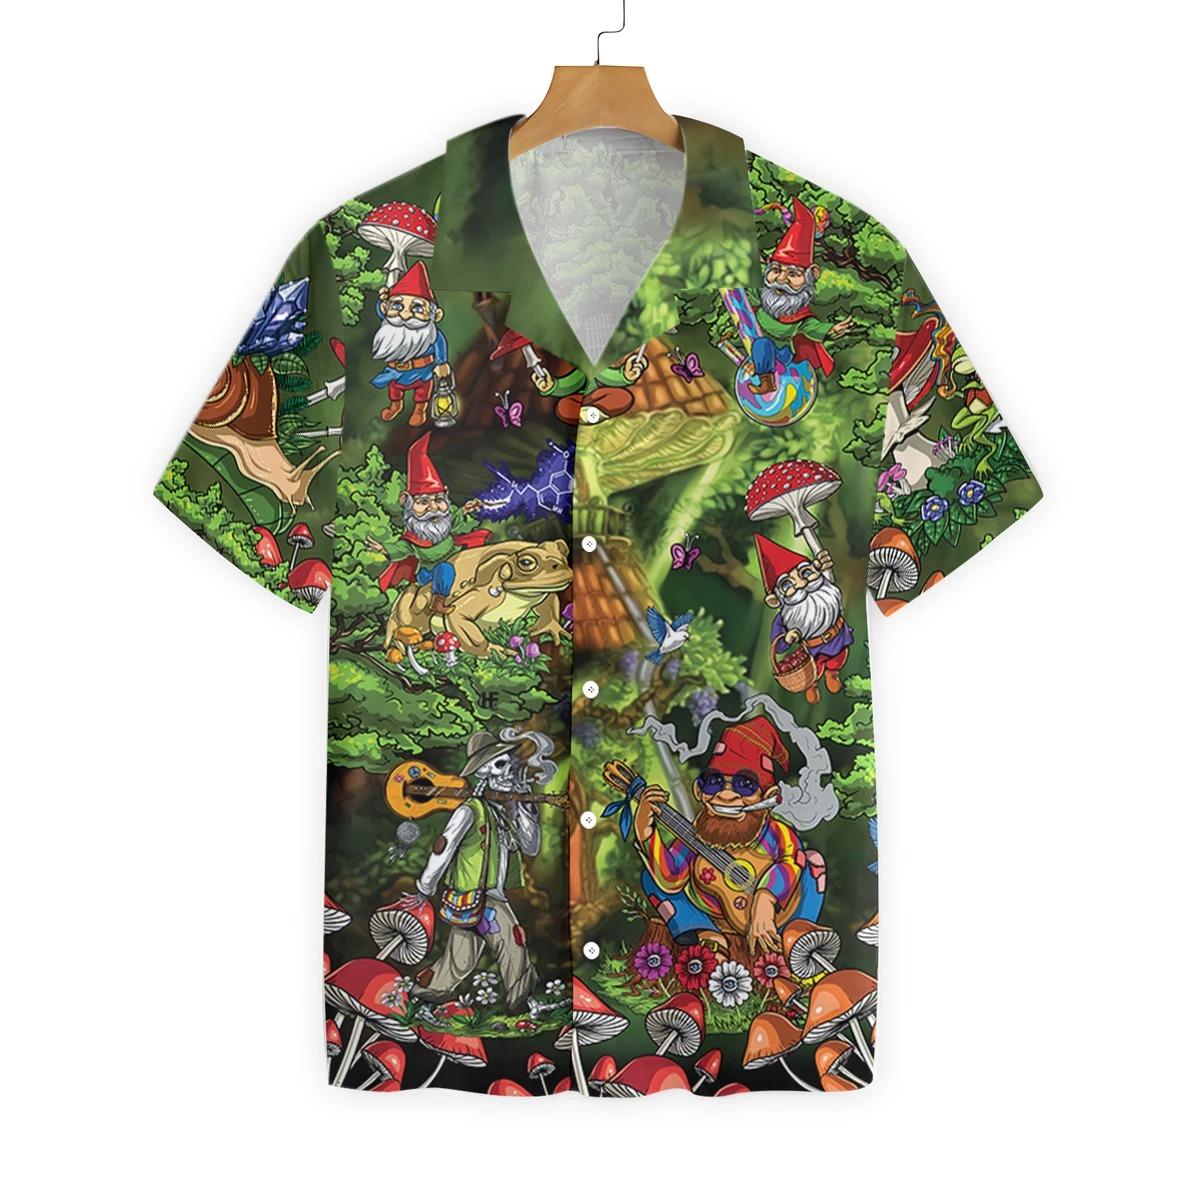 Mushroom Gnome hippie hawaiian shirt